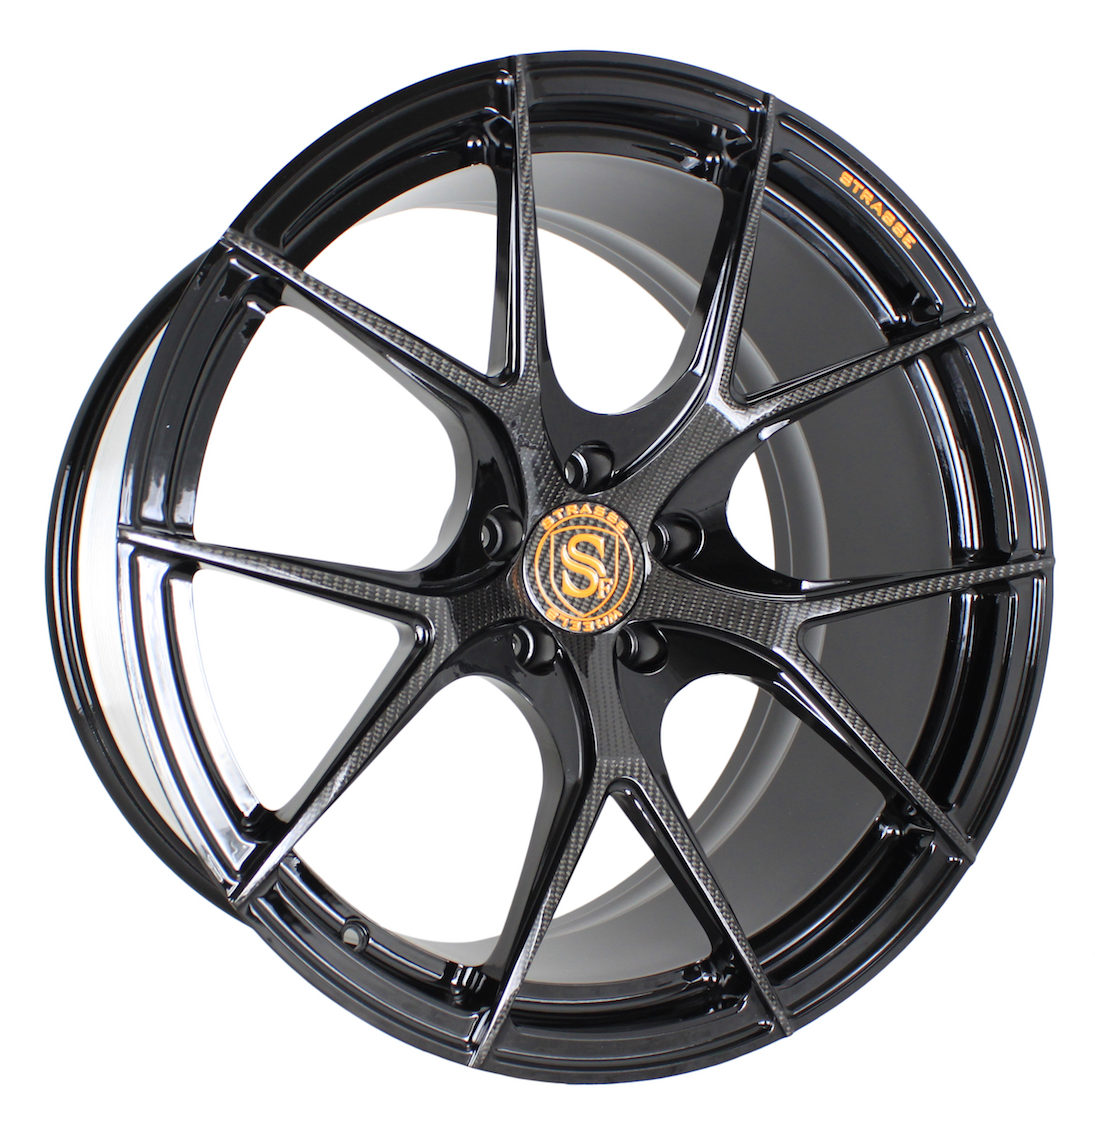 Carbon Fiber Wheels >> Carbon Fiber Edition Strasse Wheels